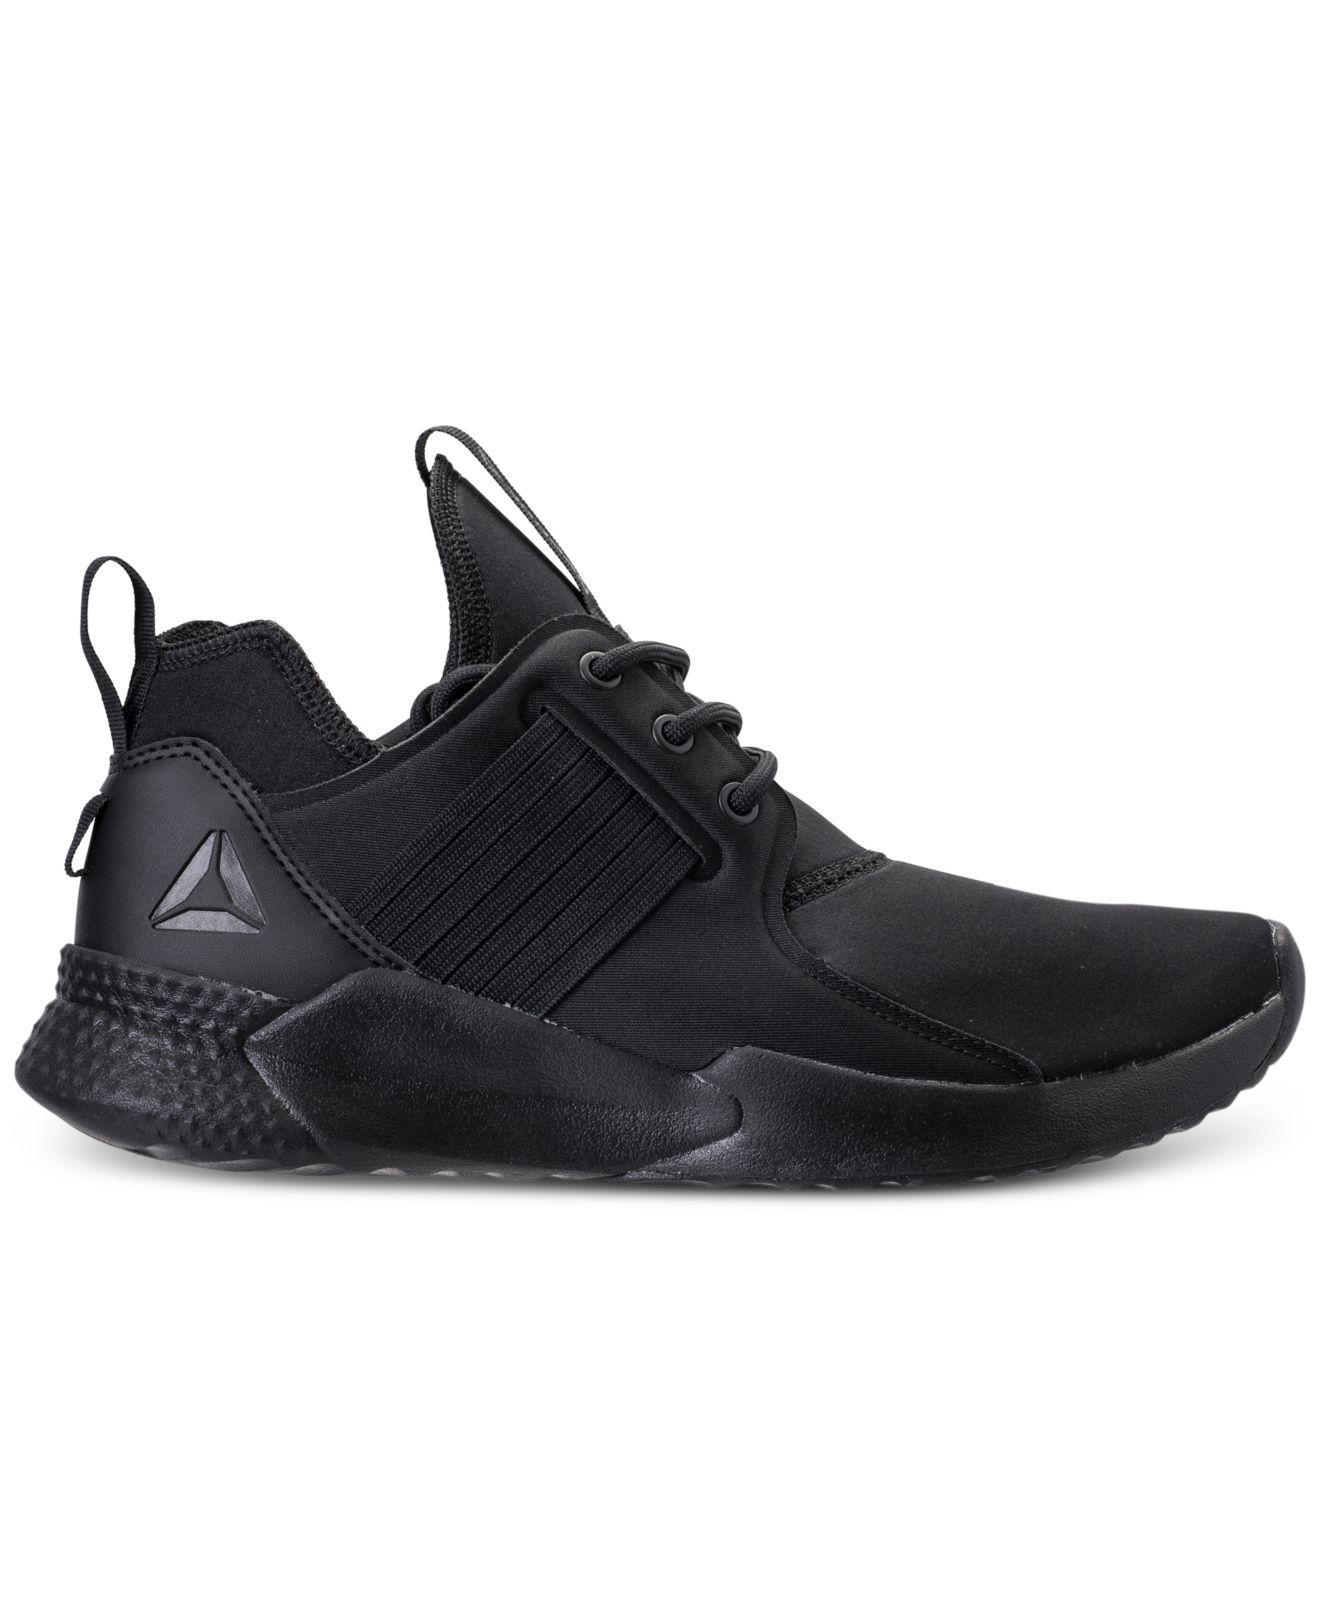 Guresu 1.0 Casual Sneakers